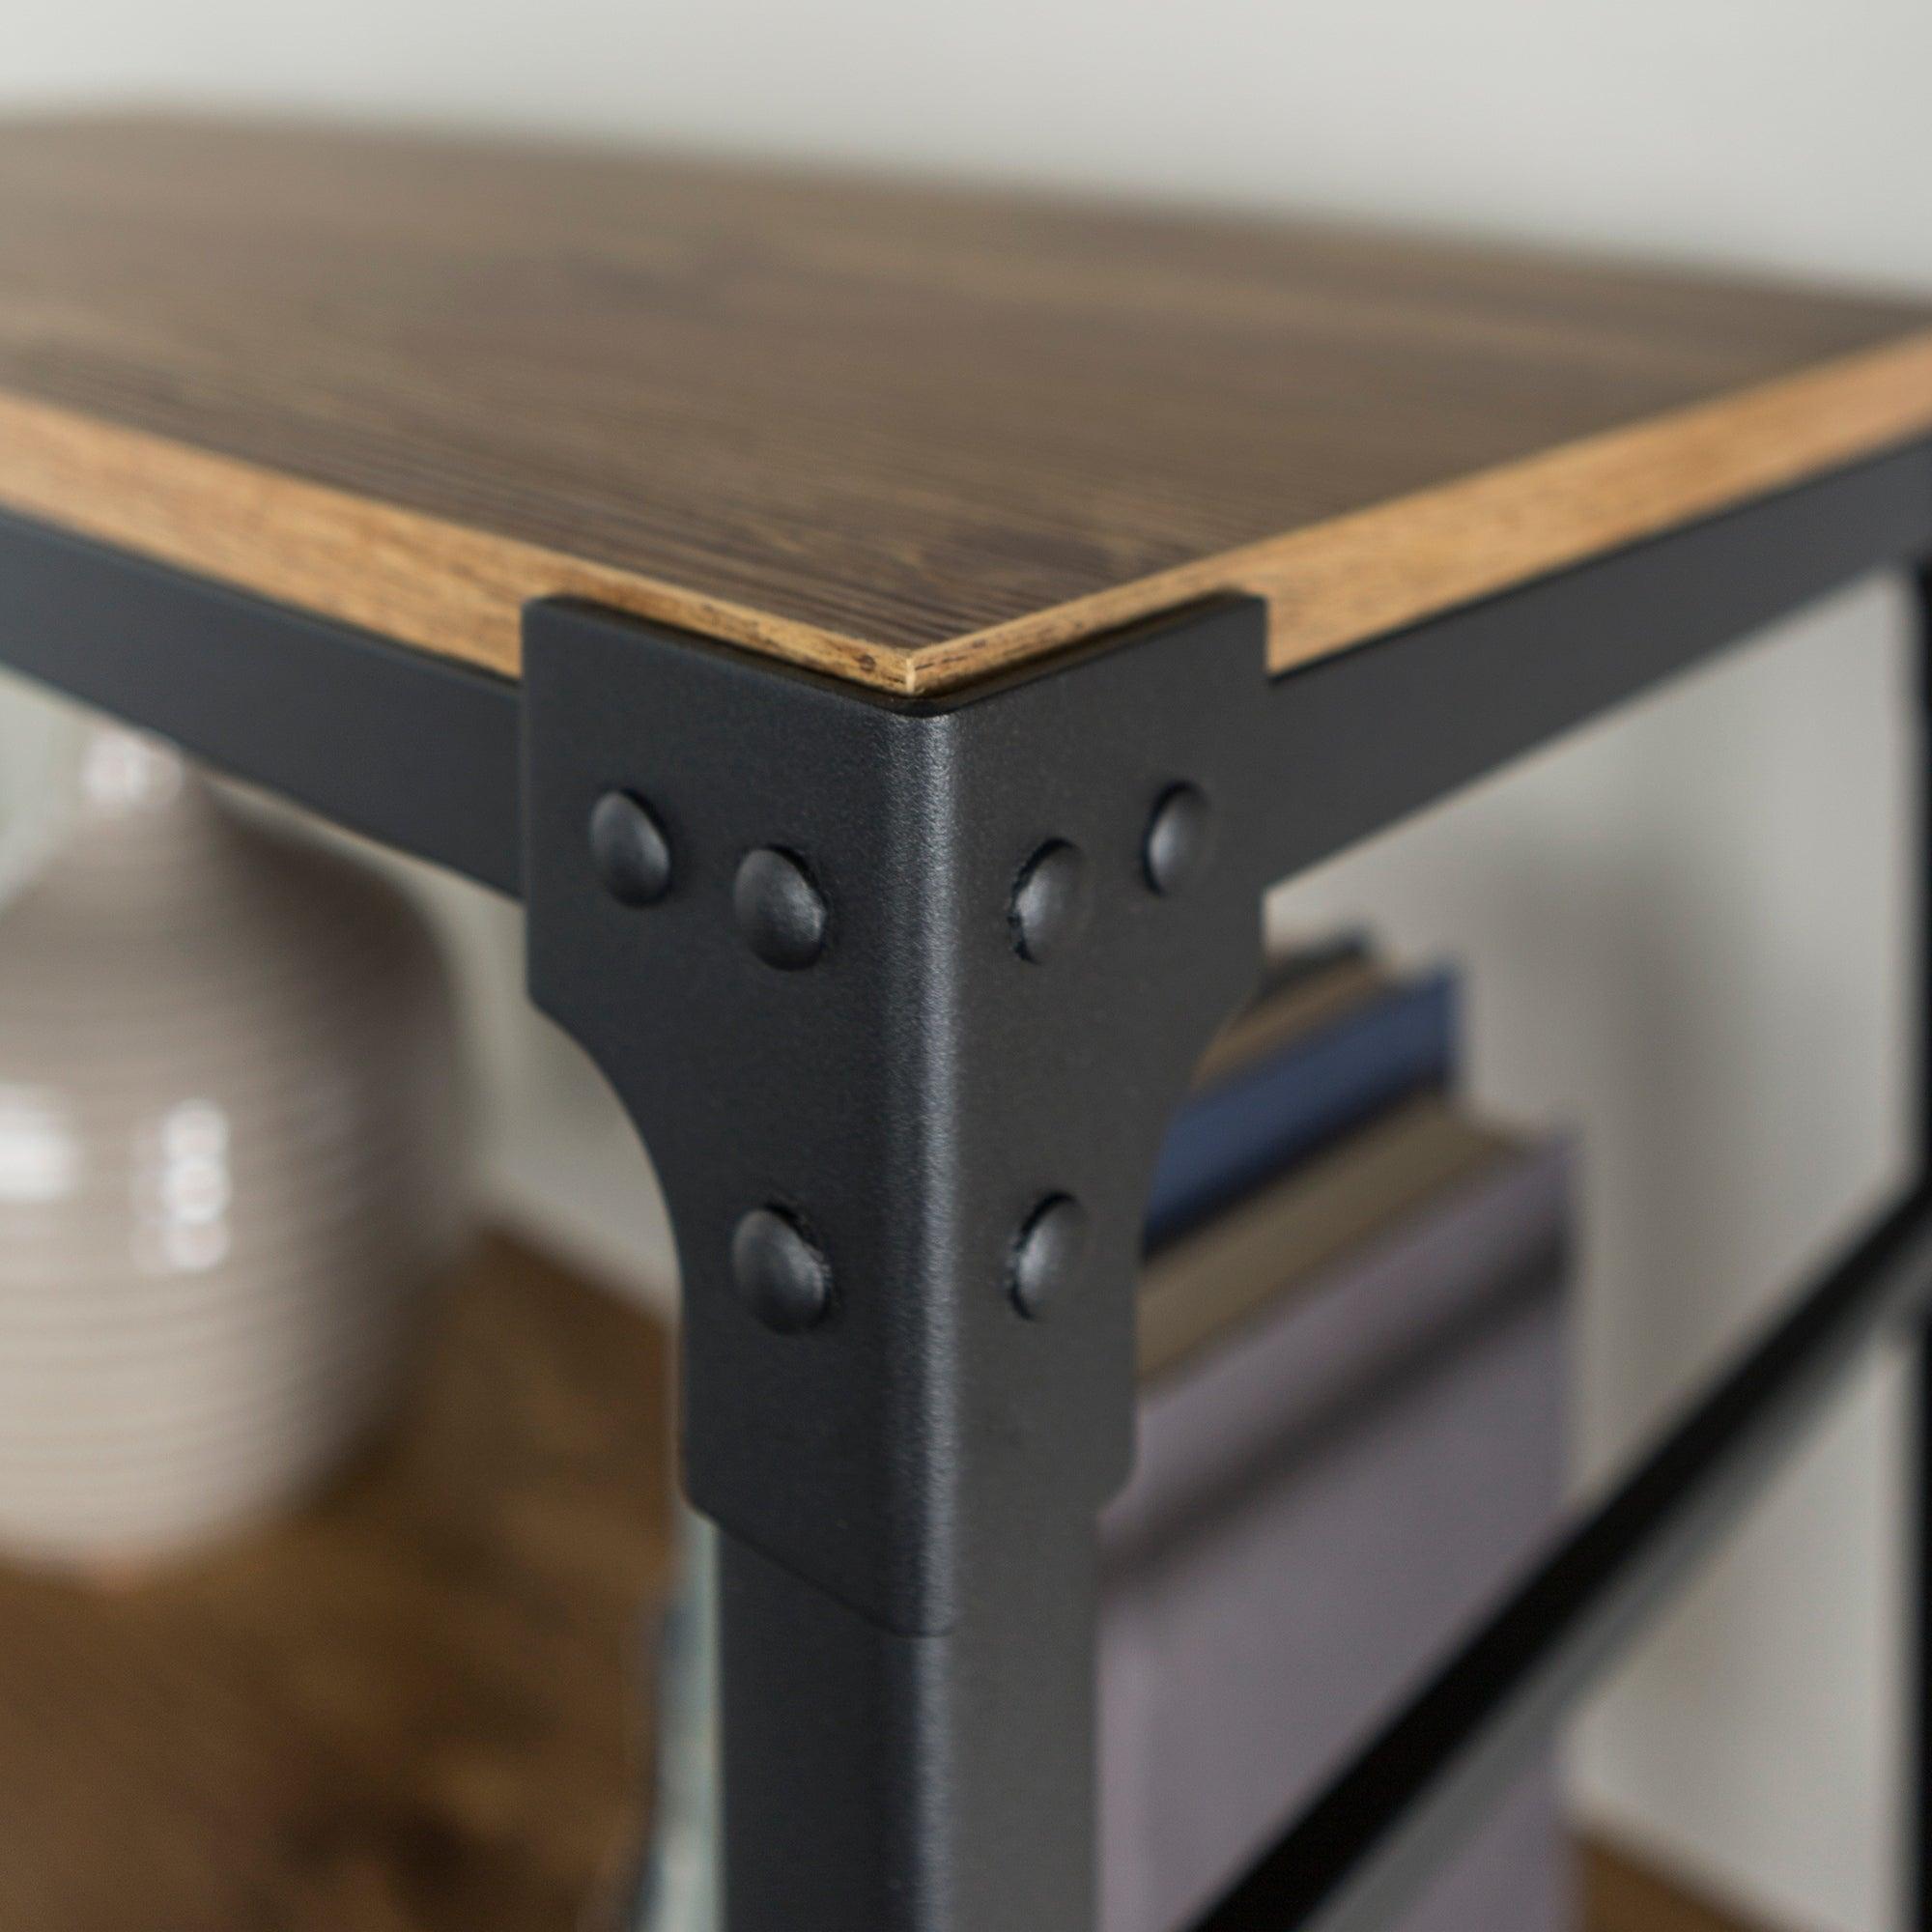 table gray the end kujawa iron garden free barn modern angle today angled bookshelf product shipping inch home overstock